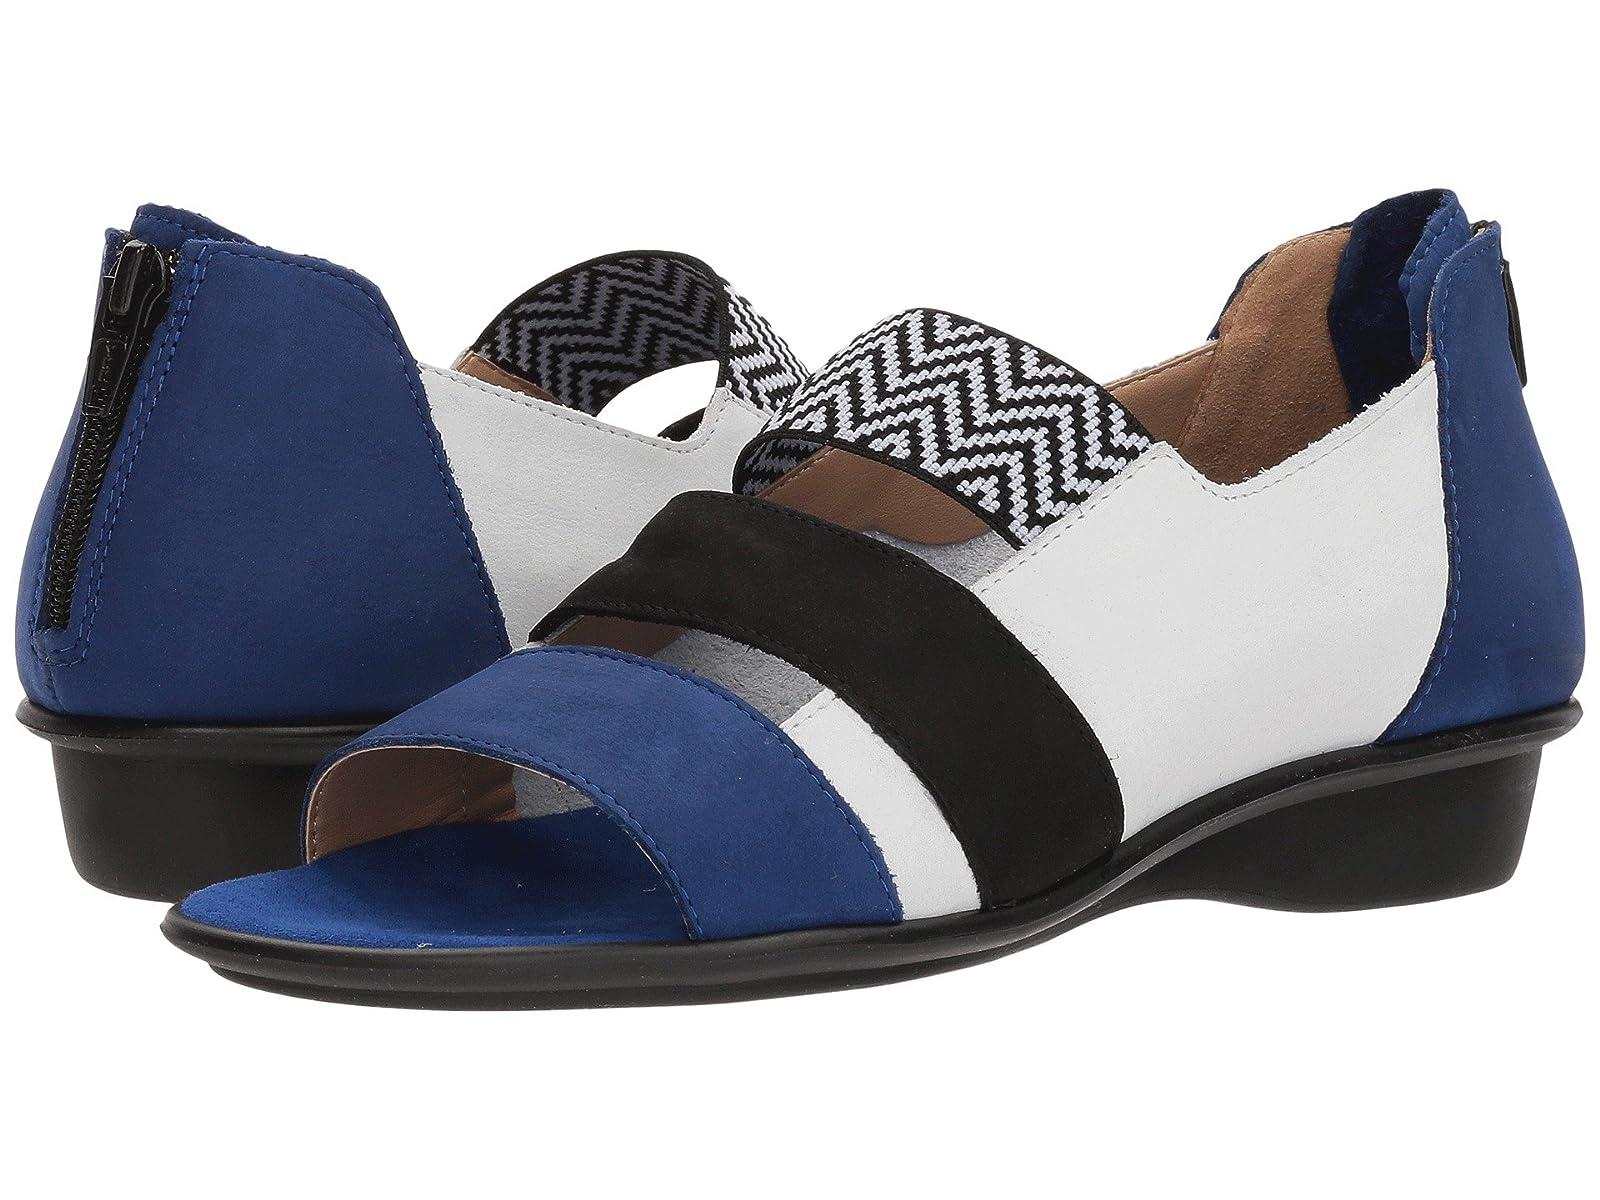 Sesto Meucci EliseCheap and distinctive eye-catching shoes